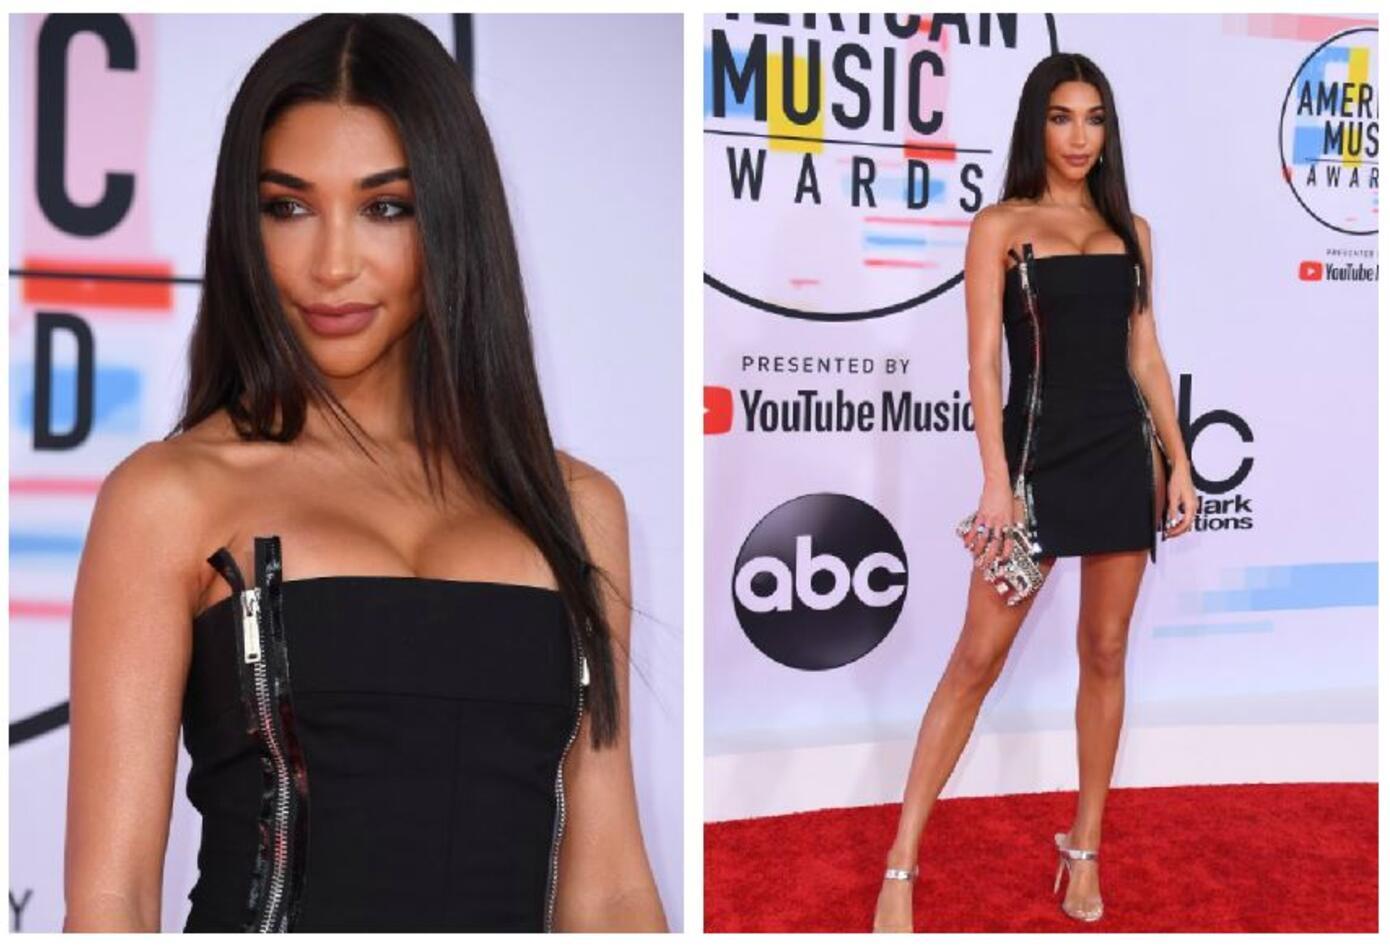 Chantel Jeffries en los American Music Awards